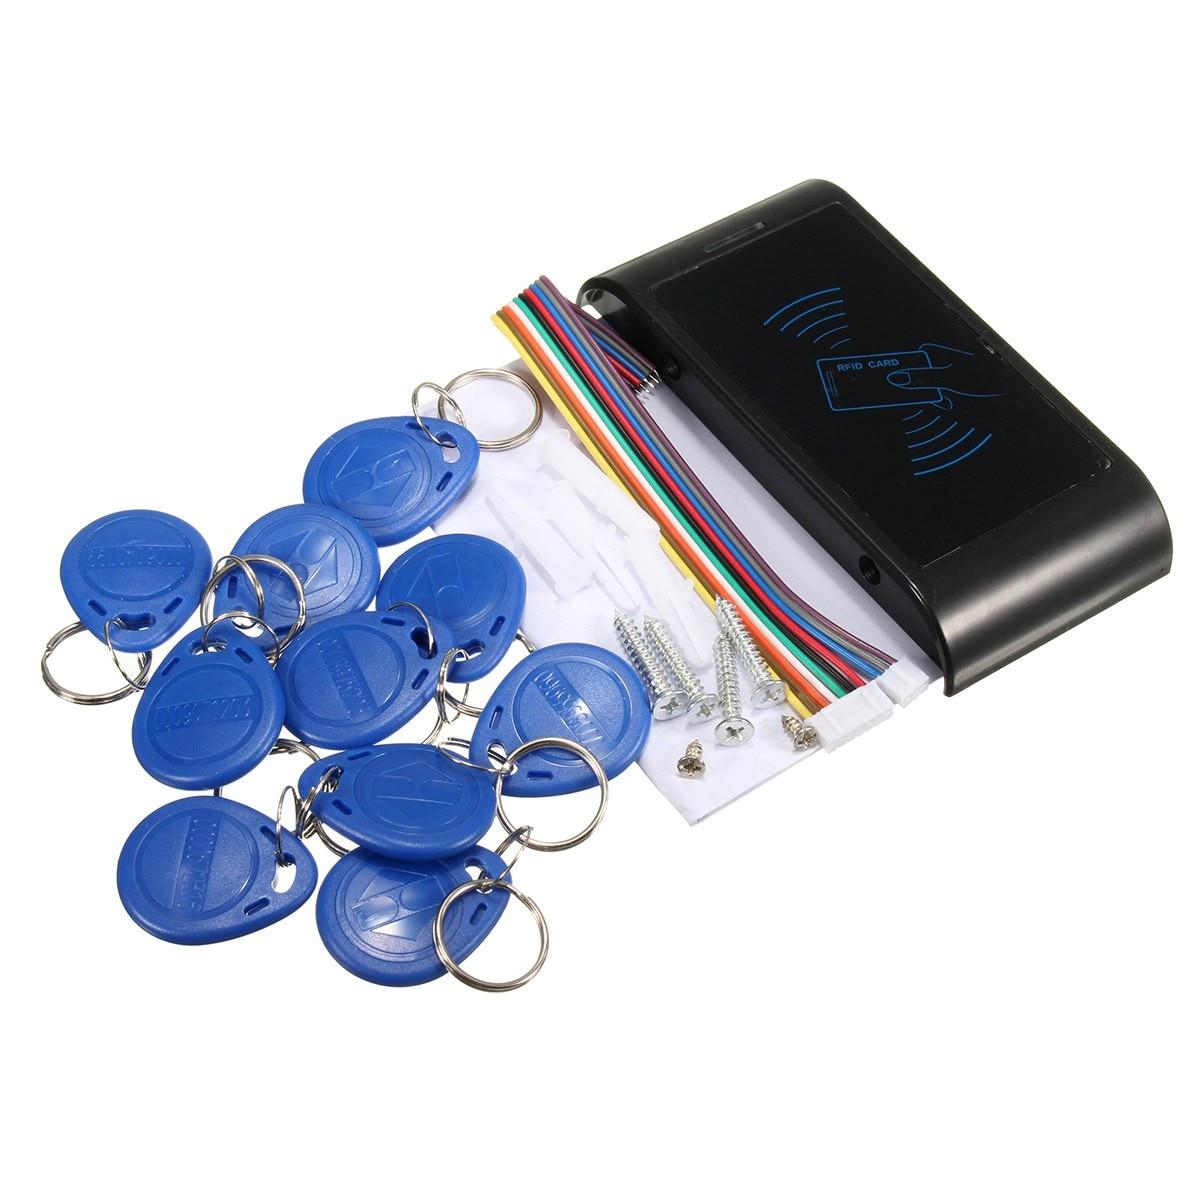 все цены на  Safurance RFID Security Entry Door Reader Card Keypad Mini ID Access Machine Controller Home Security Safety  онлайн